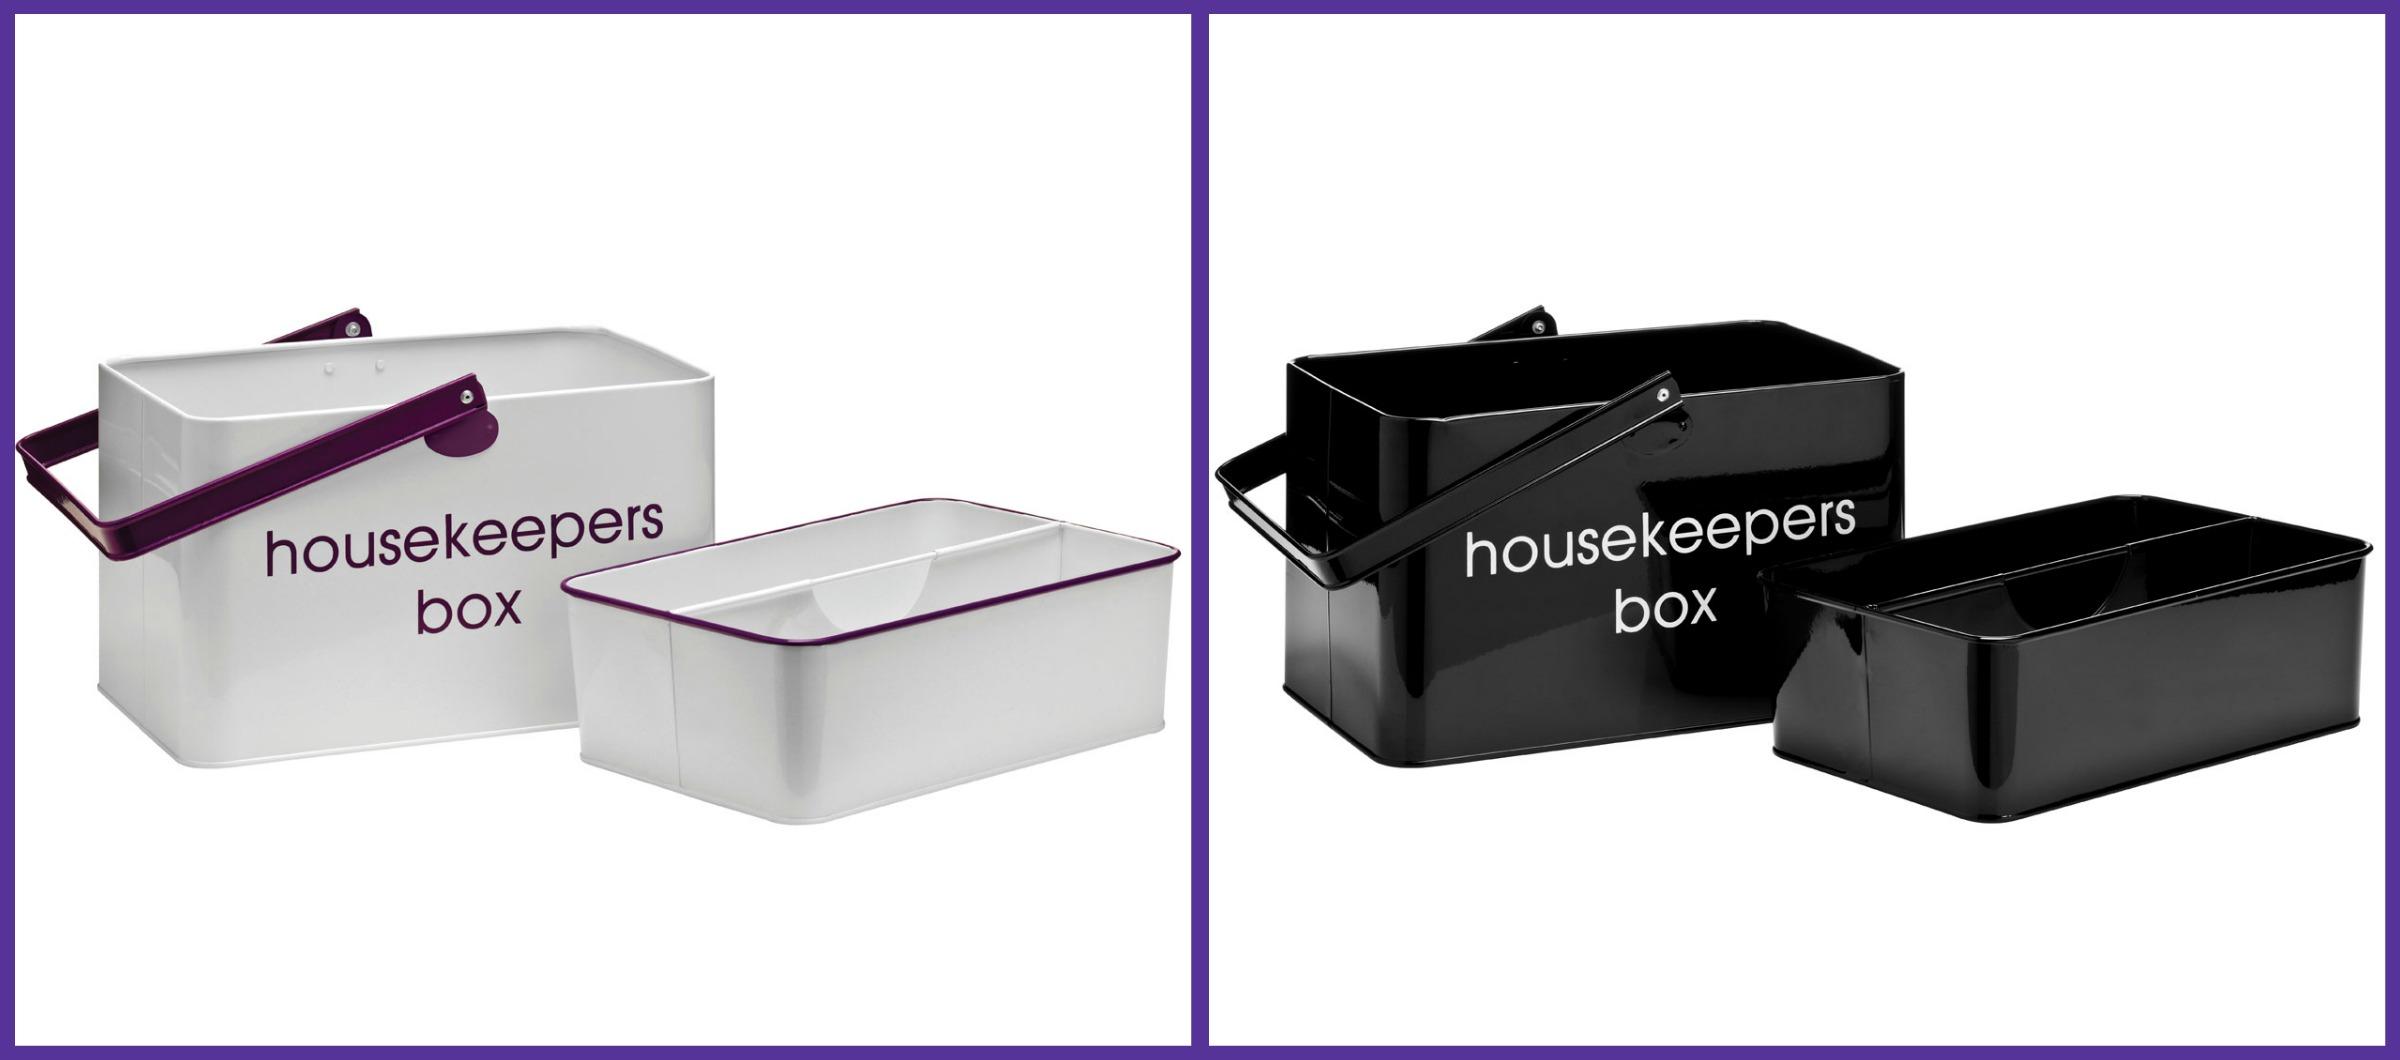 Image Is Loading Enamel Storage Box Housekeeper Carry Tray Tidy